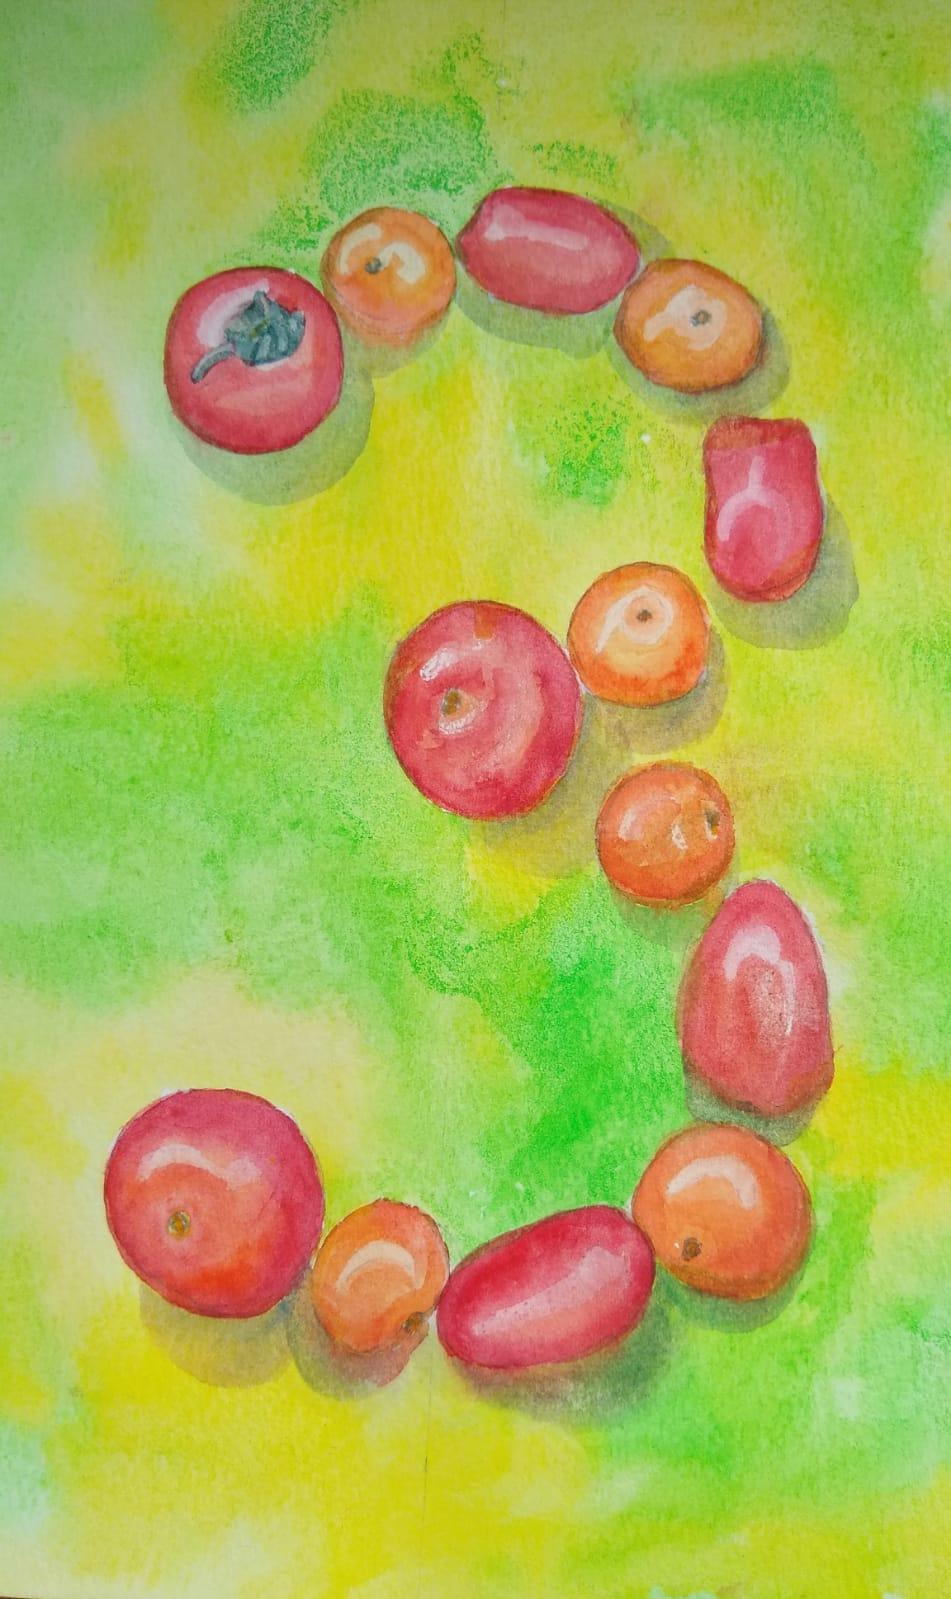 Veg or fruit by Fran